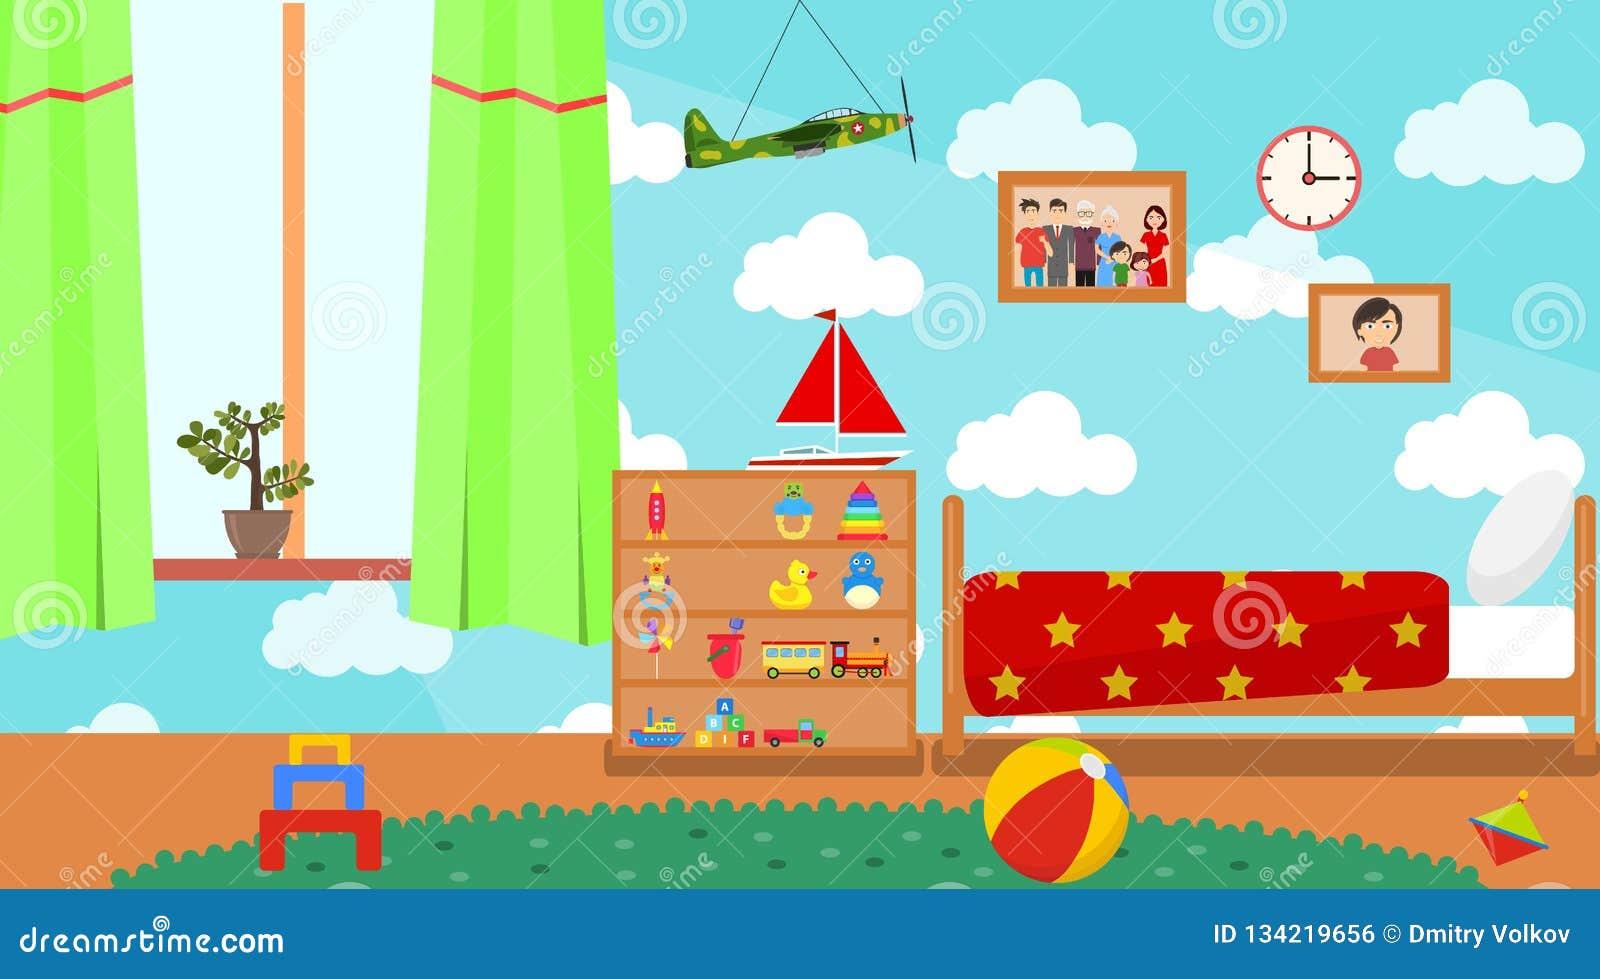 Cartoon Room: Playschool Cartoons, Illustrations & Vector Stock Images